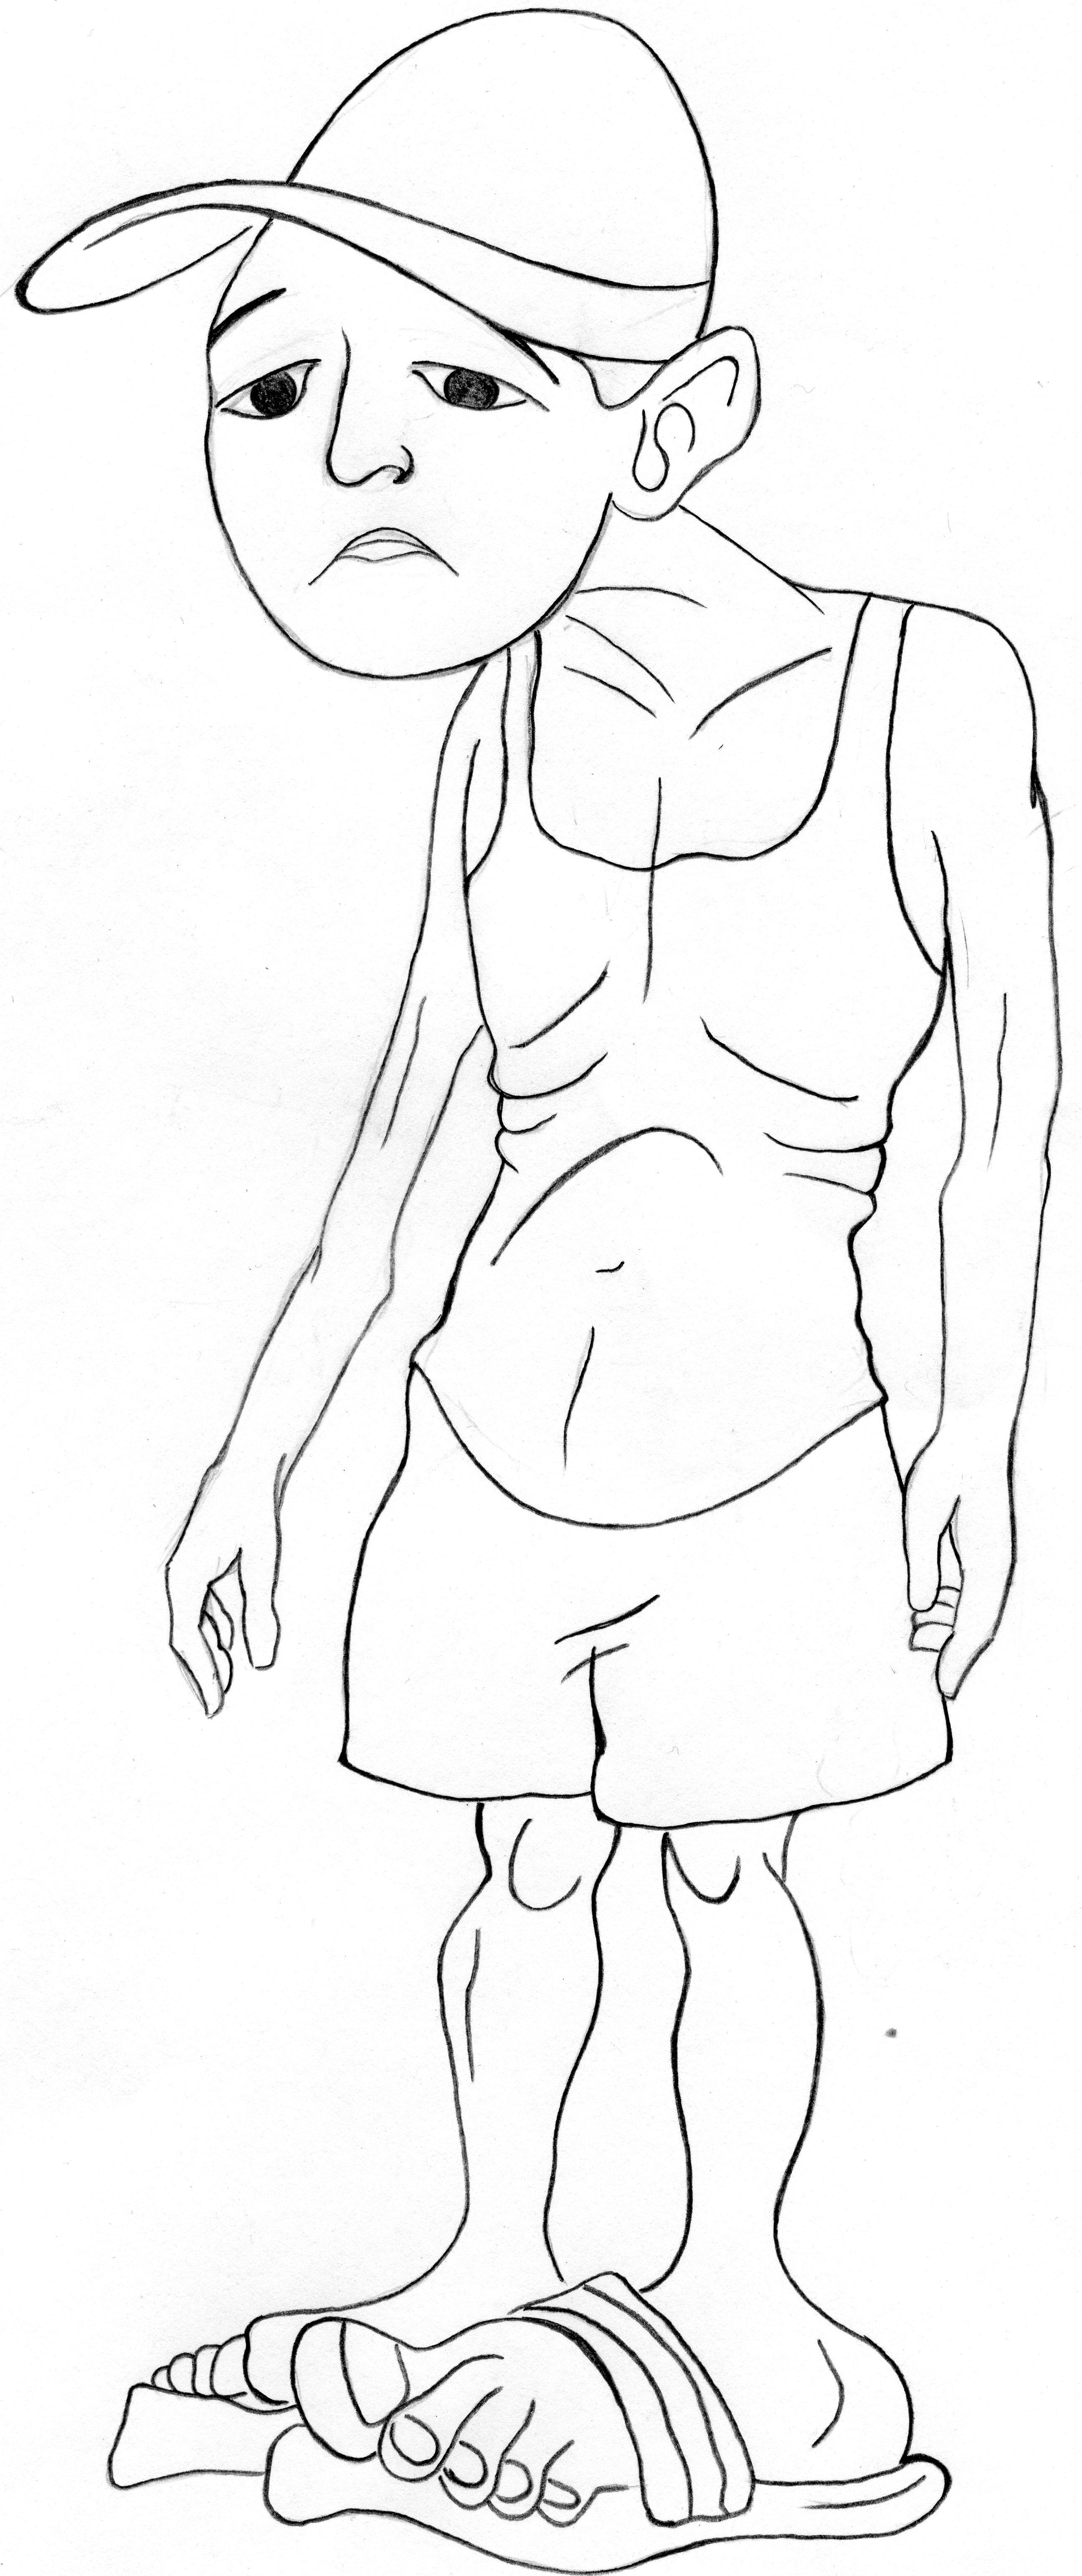 D:\Документы\Мои рисунки\img144.jpg